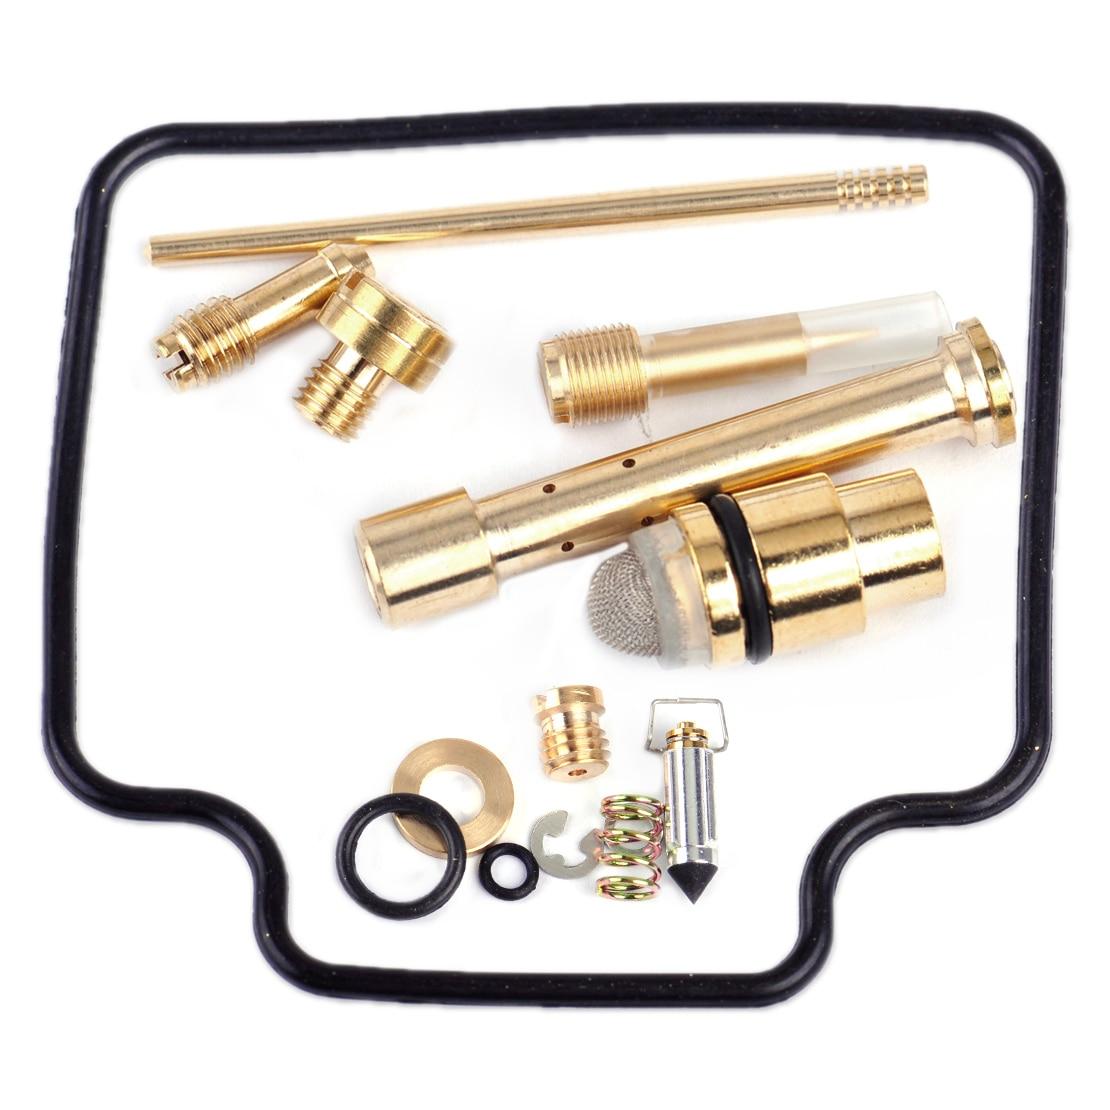 Dwcx 14pcs stable metal rubber carburetor carb rebuild repair kit for suzuki quadrunner 500 ltf500f 1998 1999 2000 2001 2002